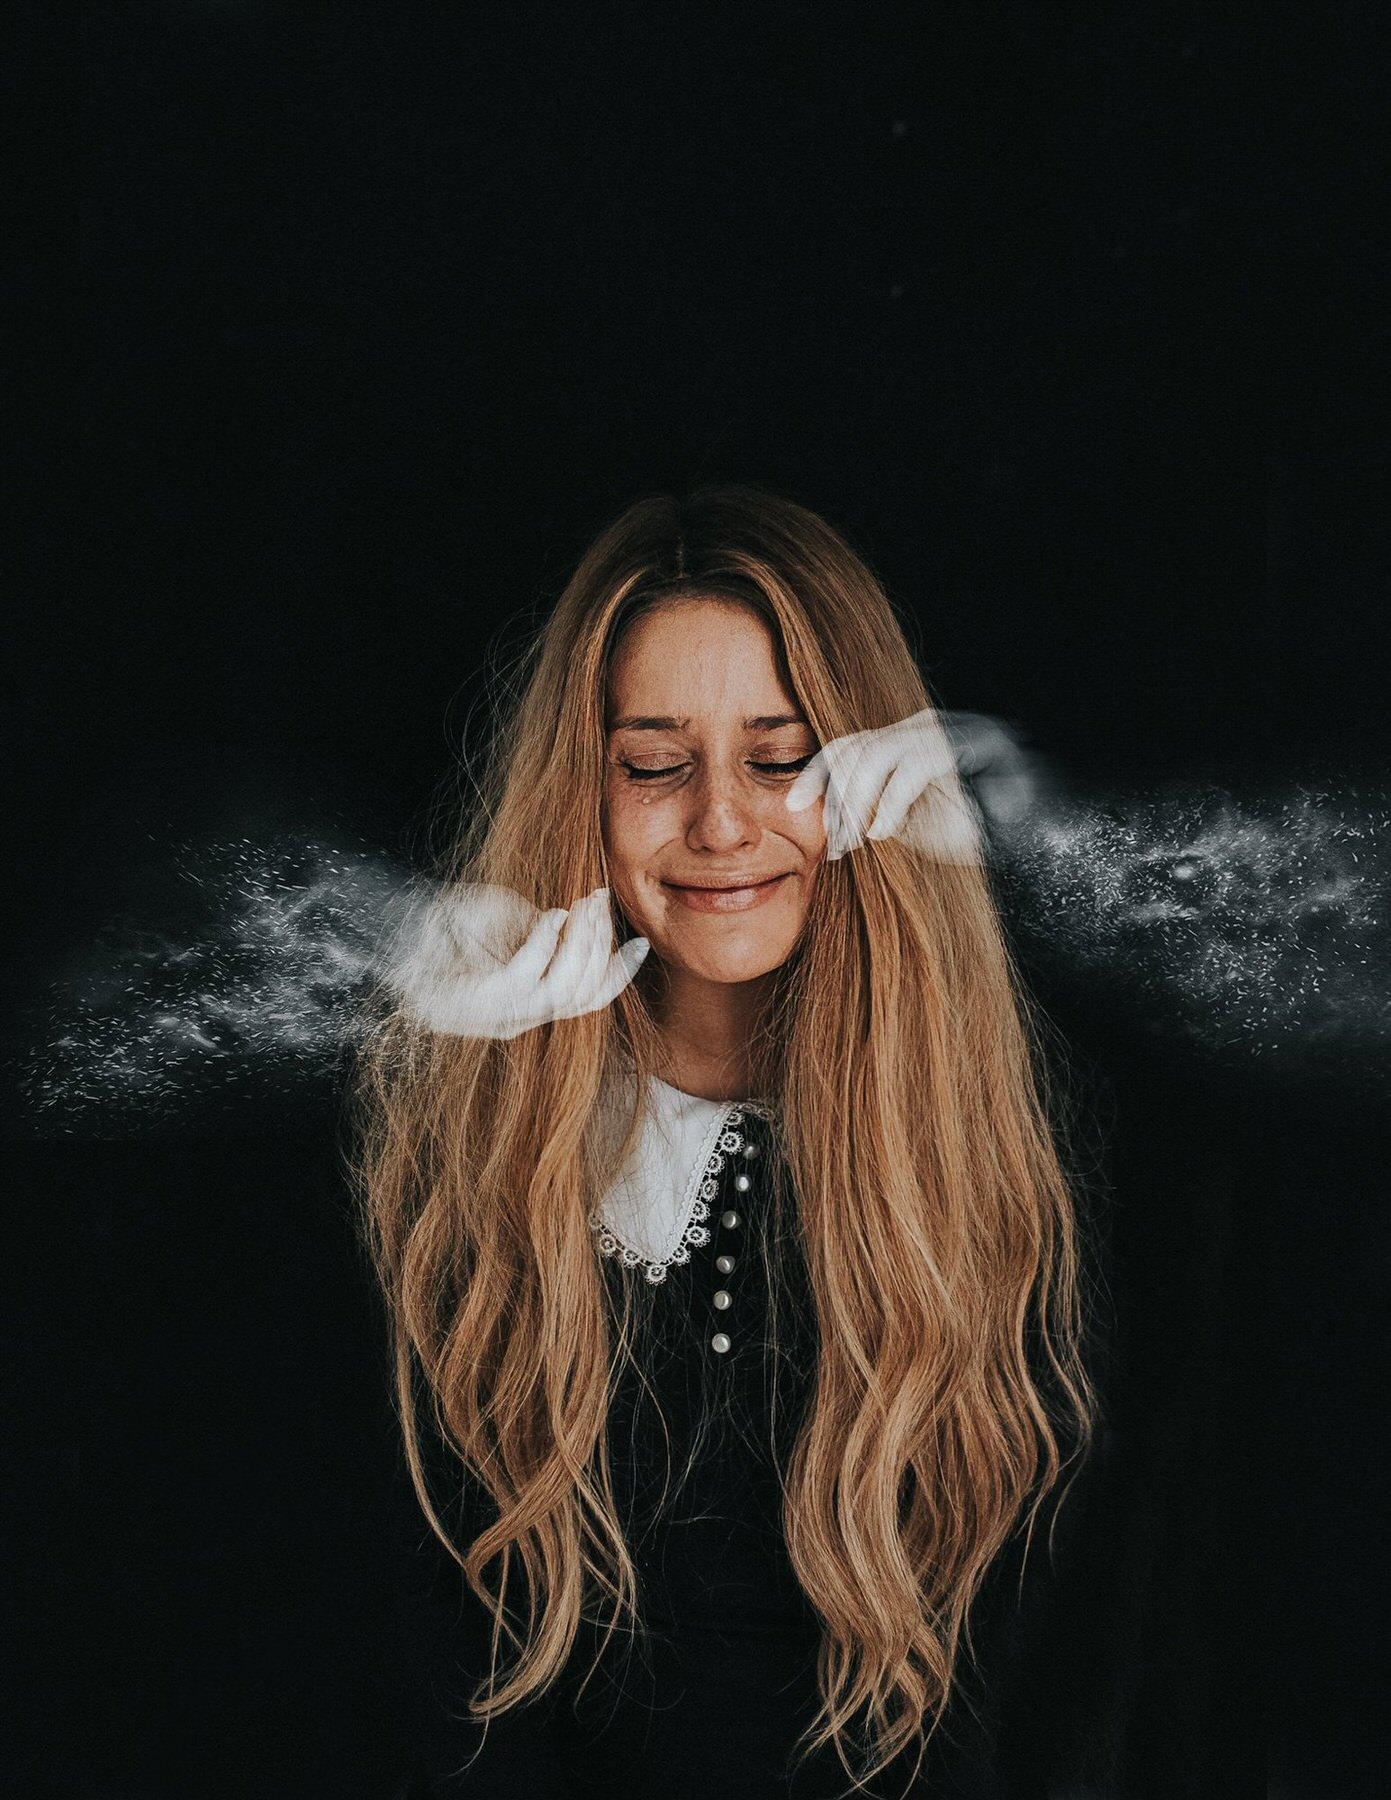 Rosie Hardy Smoke Hands Image